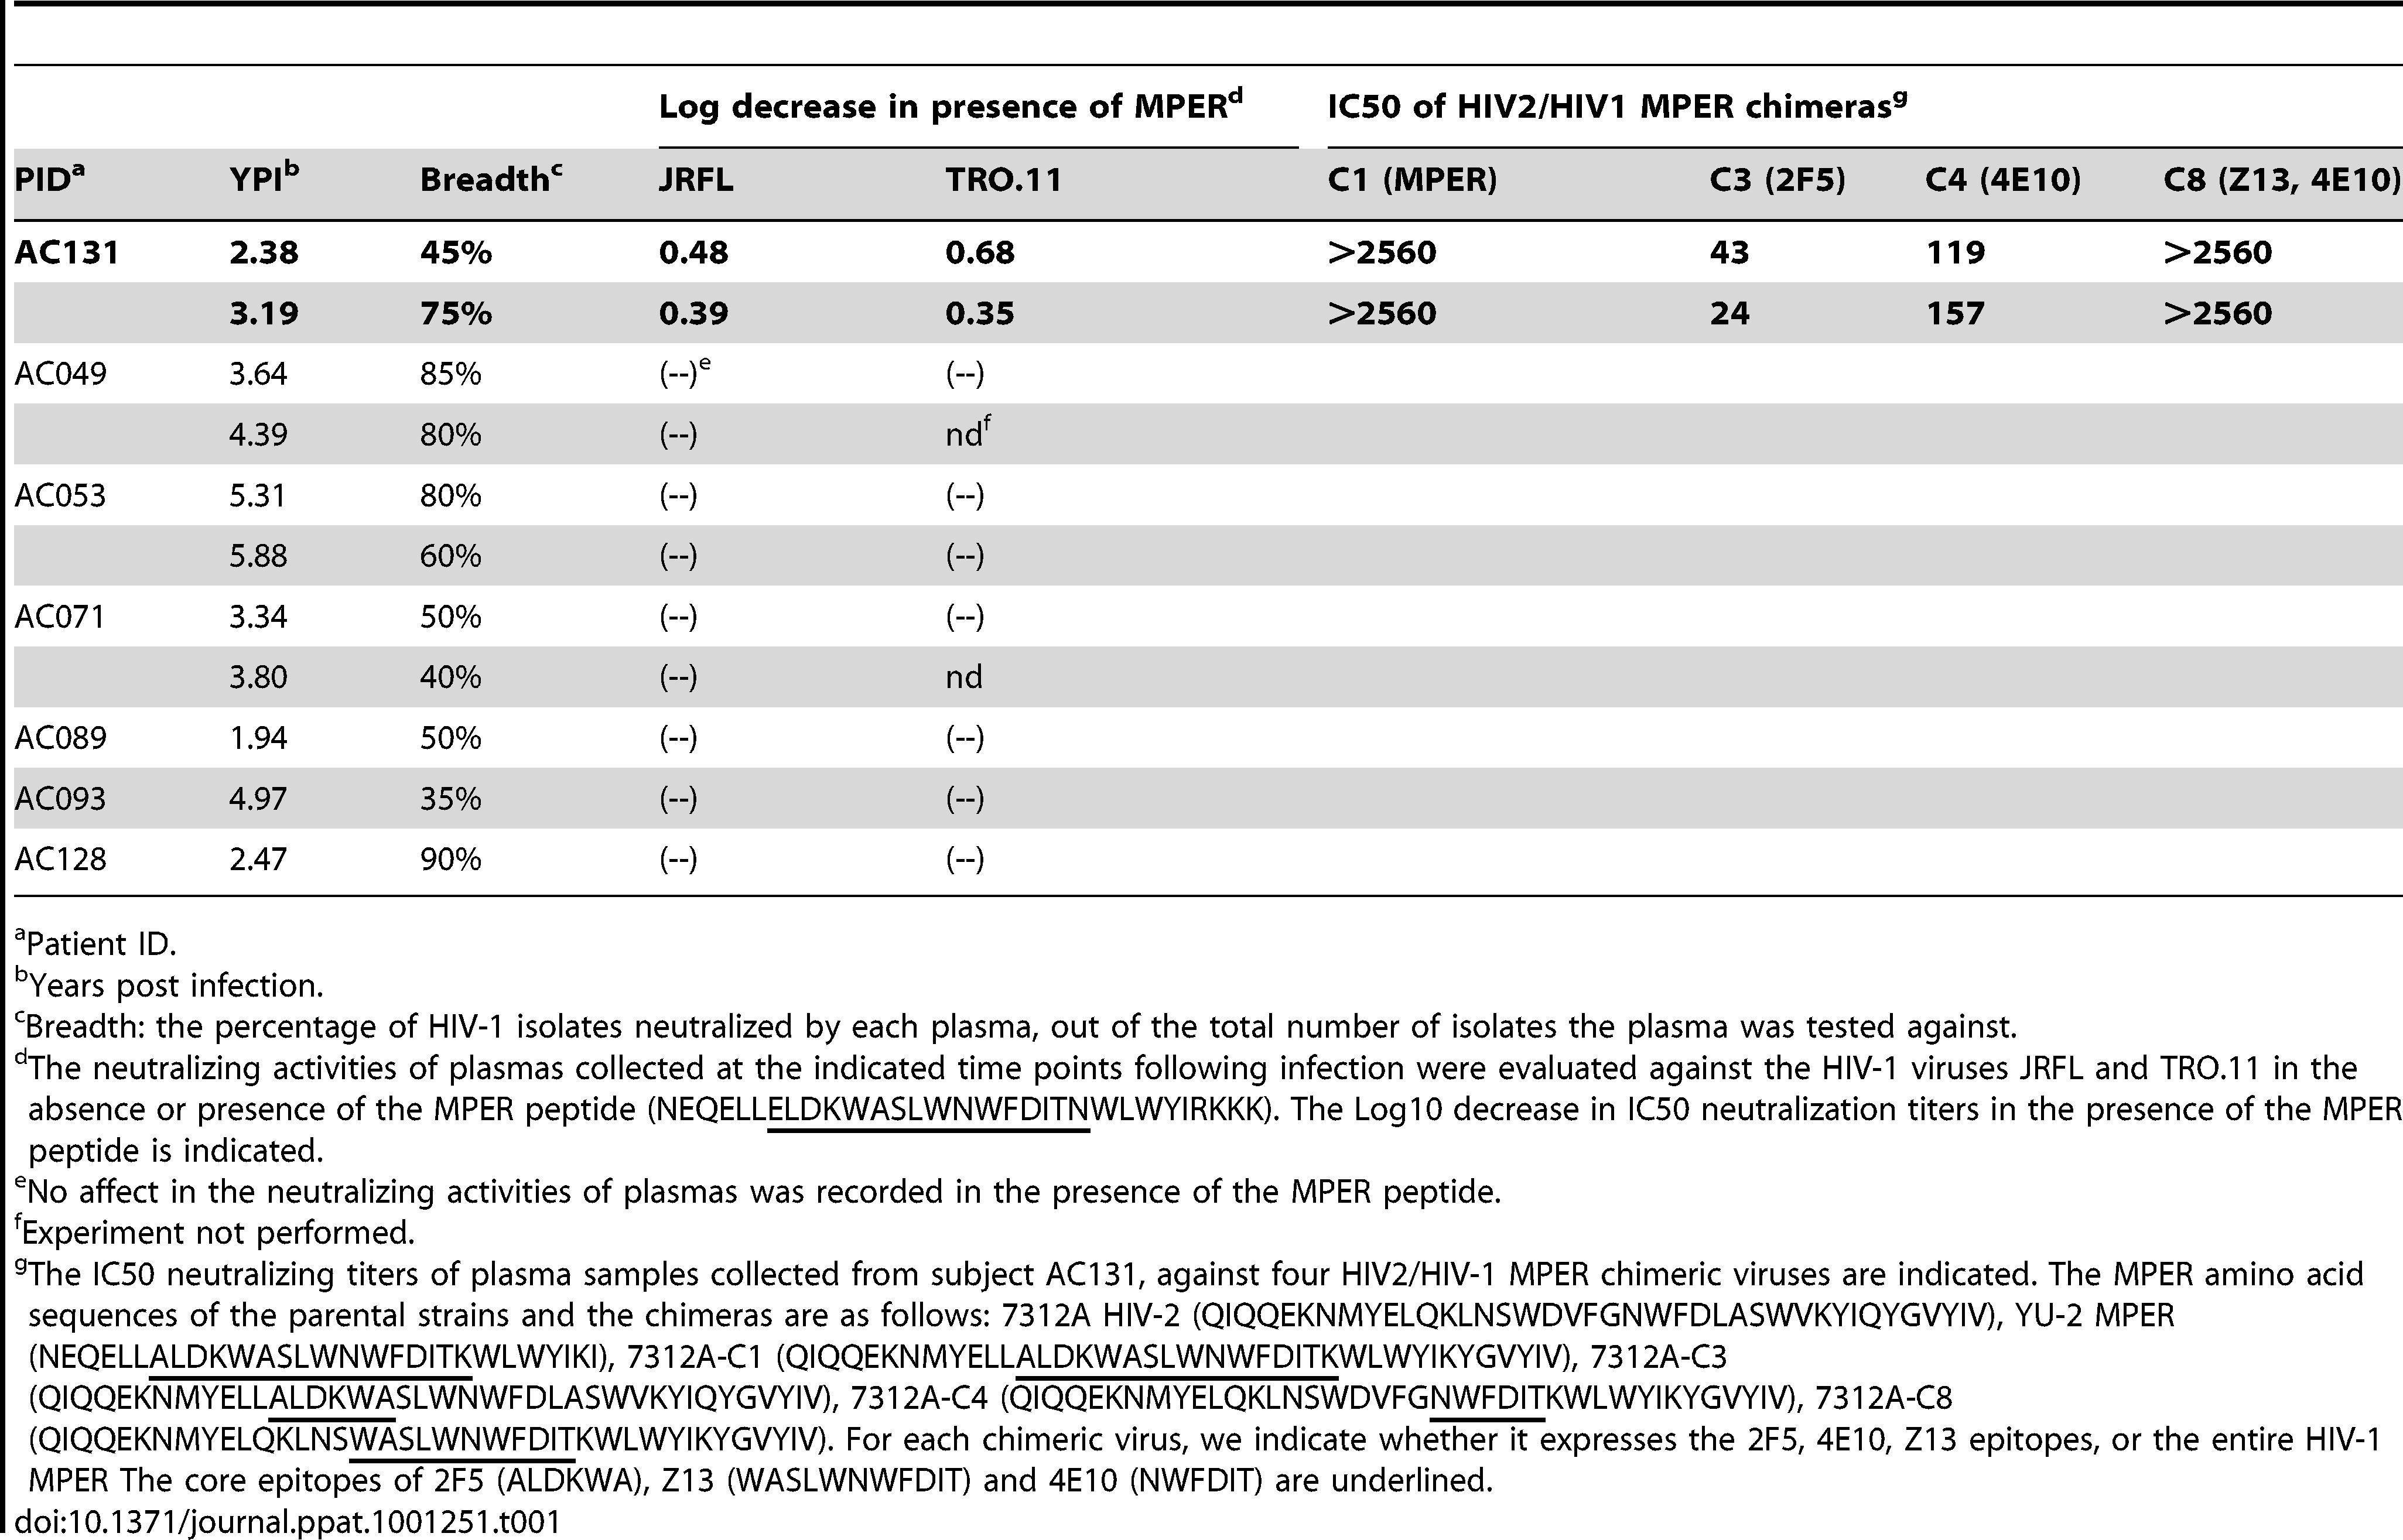 Contribution of anti-MPER antibodies to the plasma's cross-neutralizing activities.